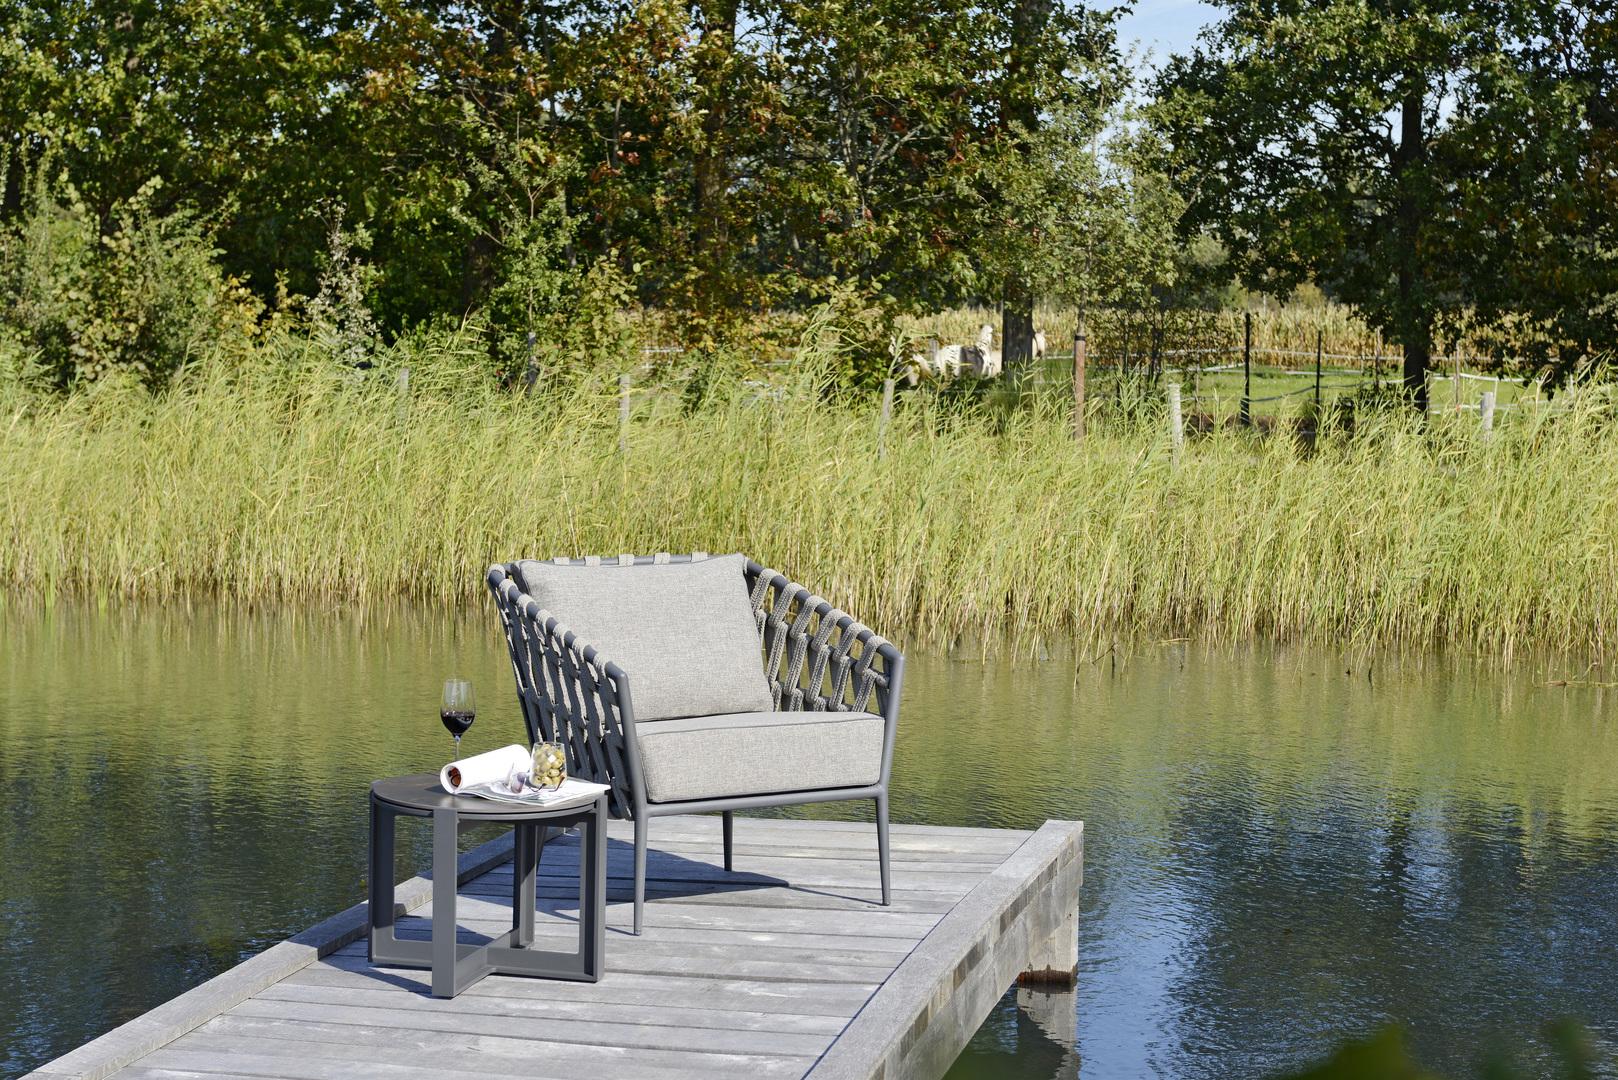 2019 Borek Ardenza belt Tavira lounge chair Studio Borek - Dekton Faro side table Bertram Beerbaum (close-up) (1).jpg